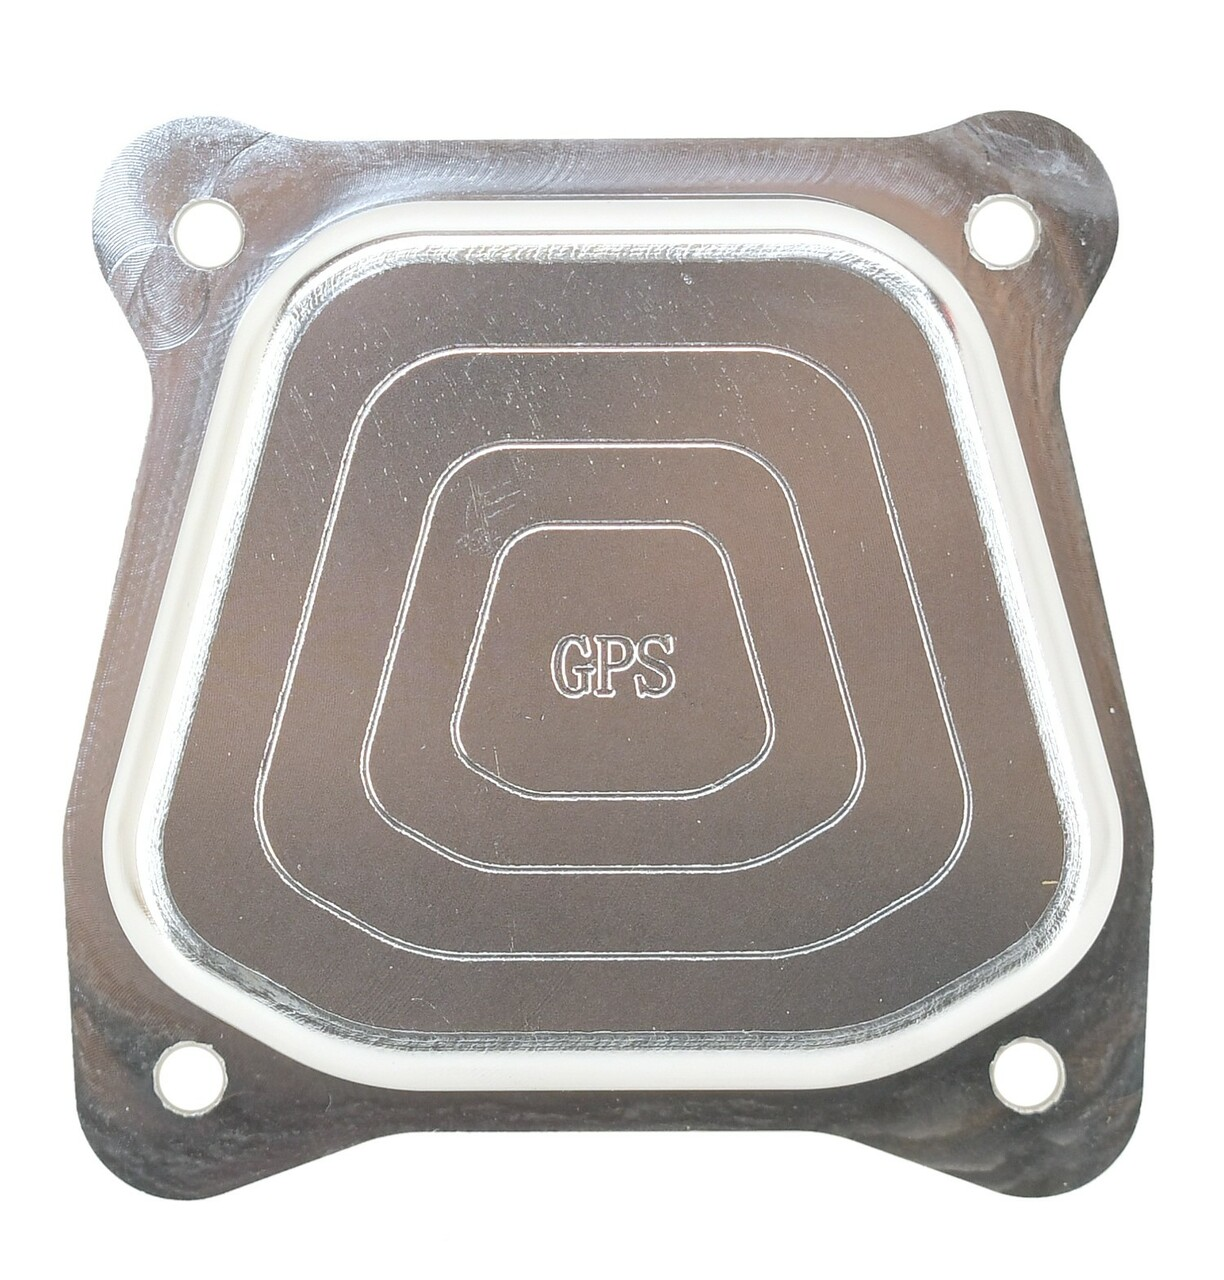 Billet Valve Cover, 212cc Non-hemi Predator/196cc clone/Honda GX160-GX200, Silver